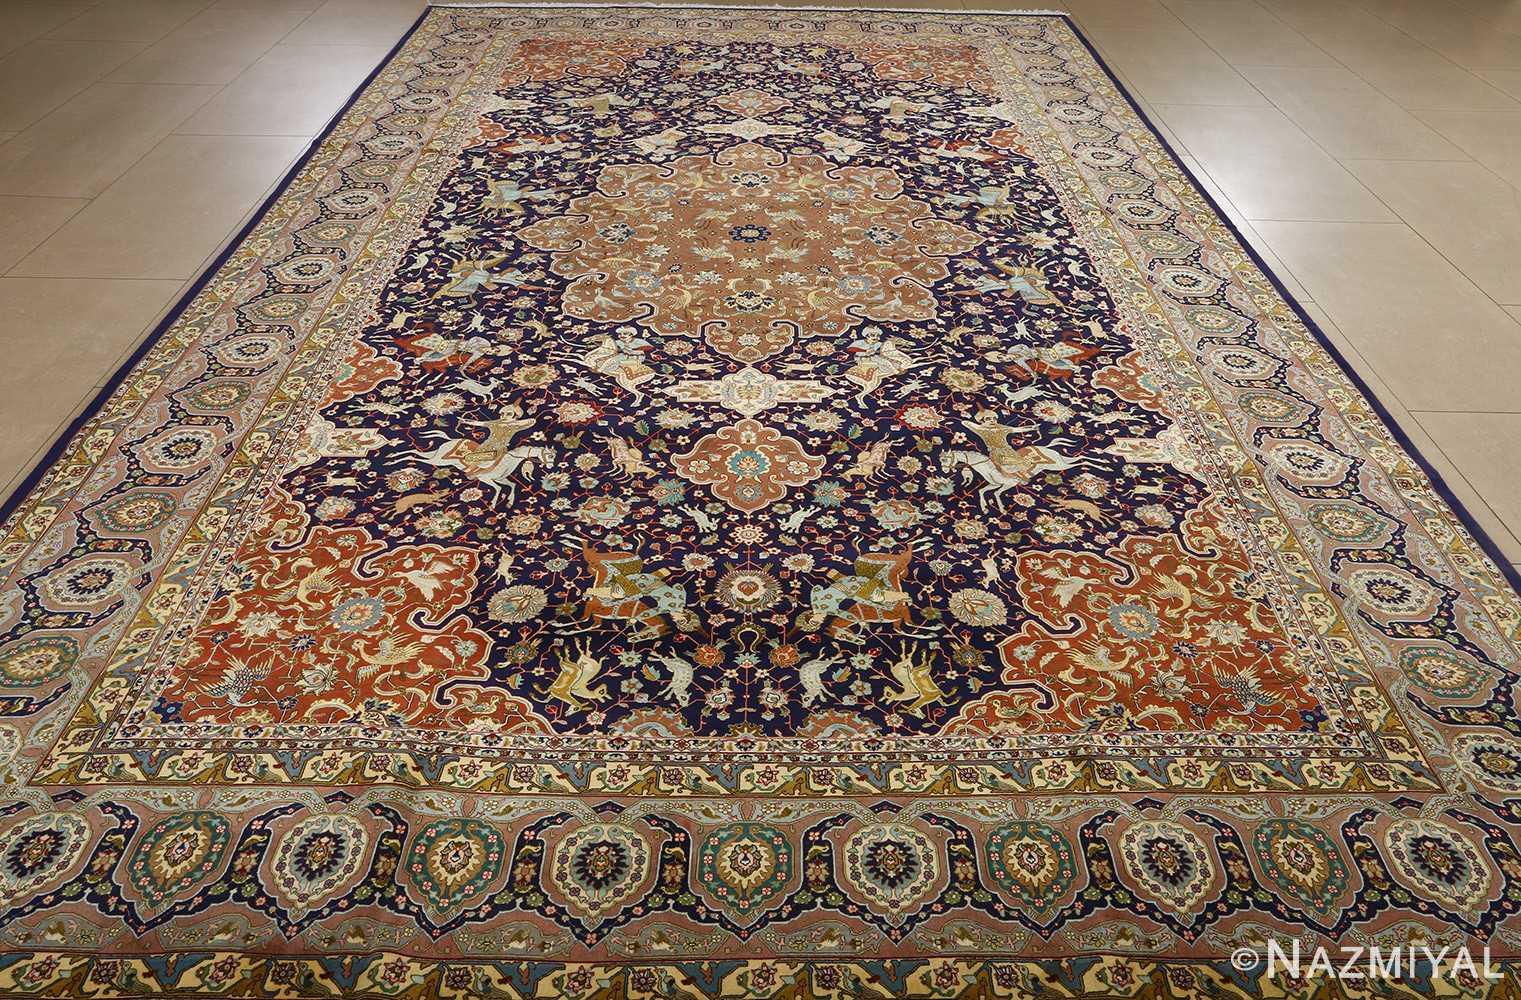 fine heydarzadeh hunting vintage tabriz persian rug 51026 nazmiyal whole